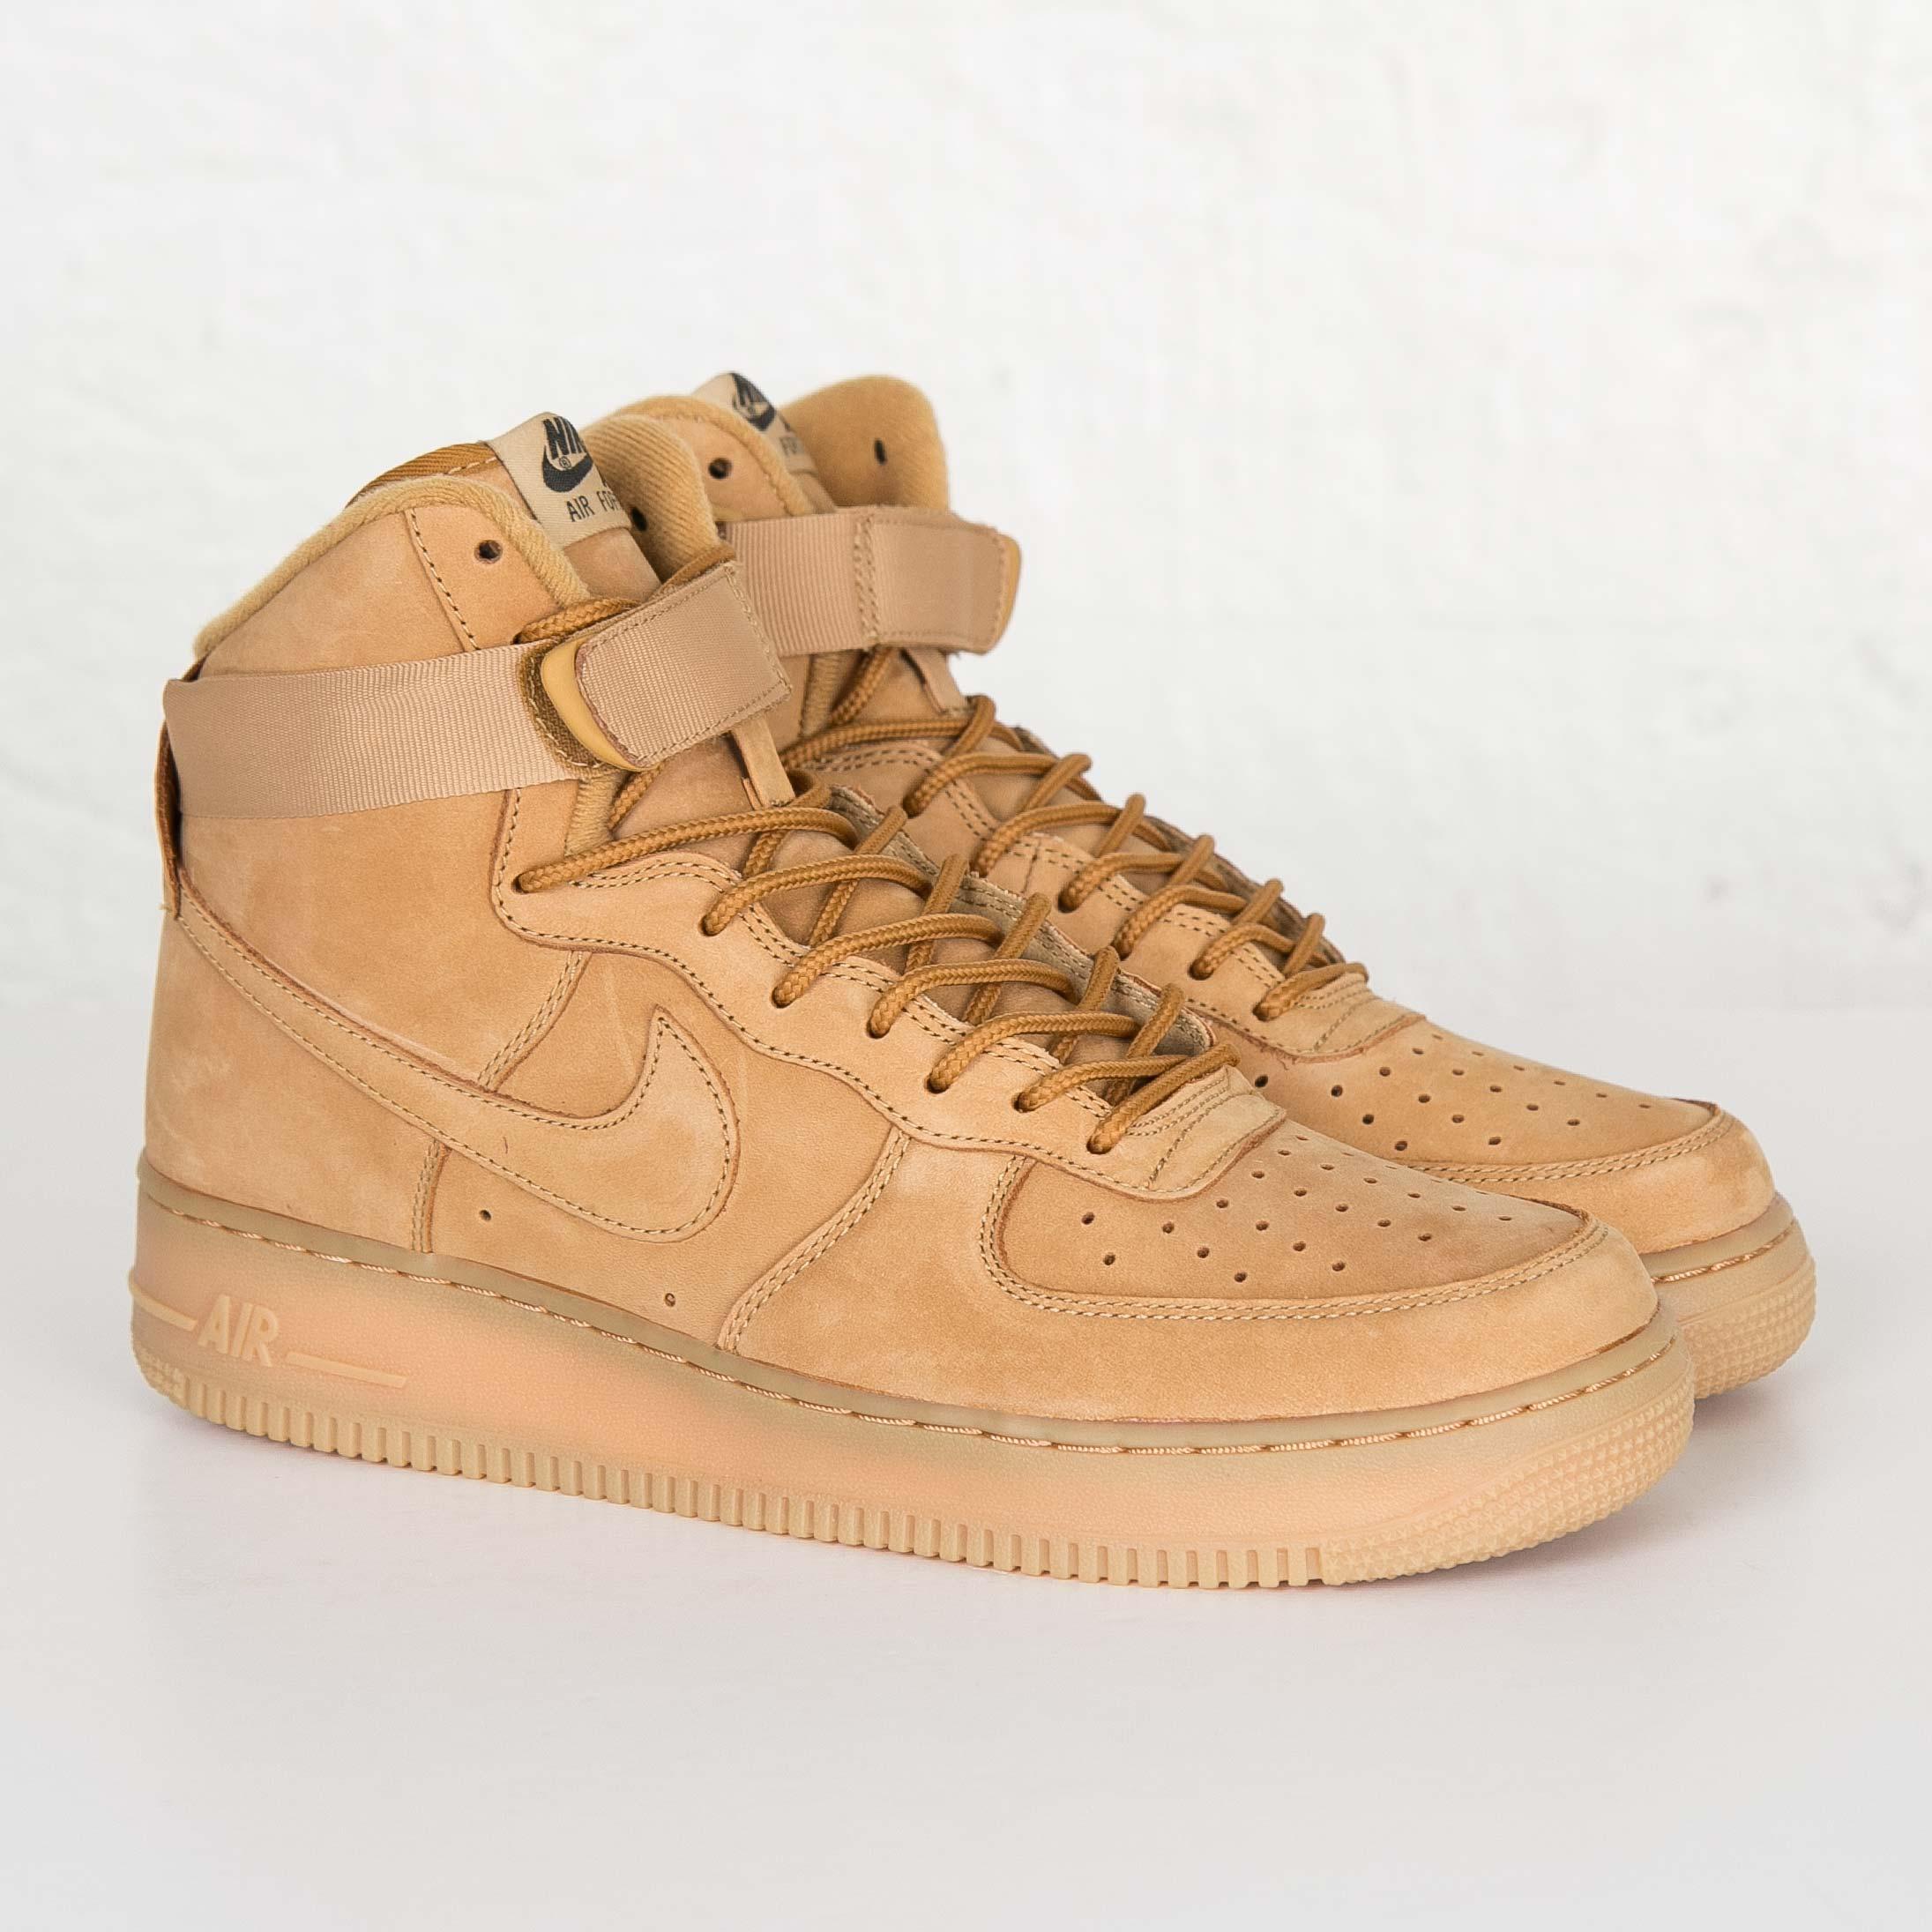 Nike Air Force 1 High '07 LV8 806403 200